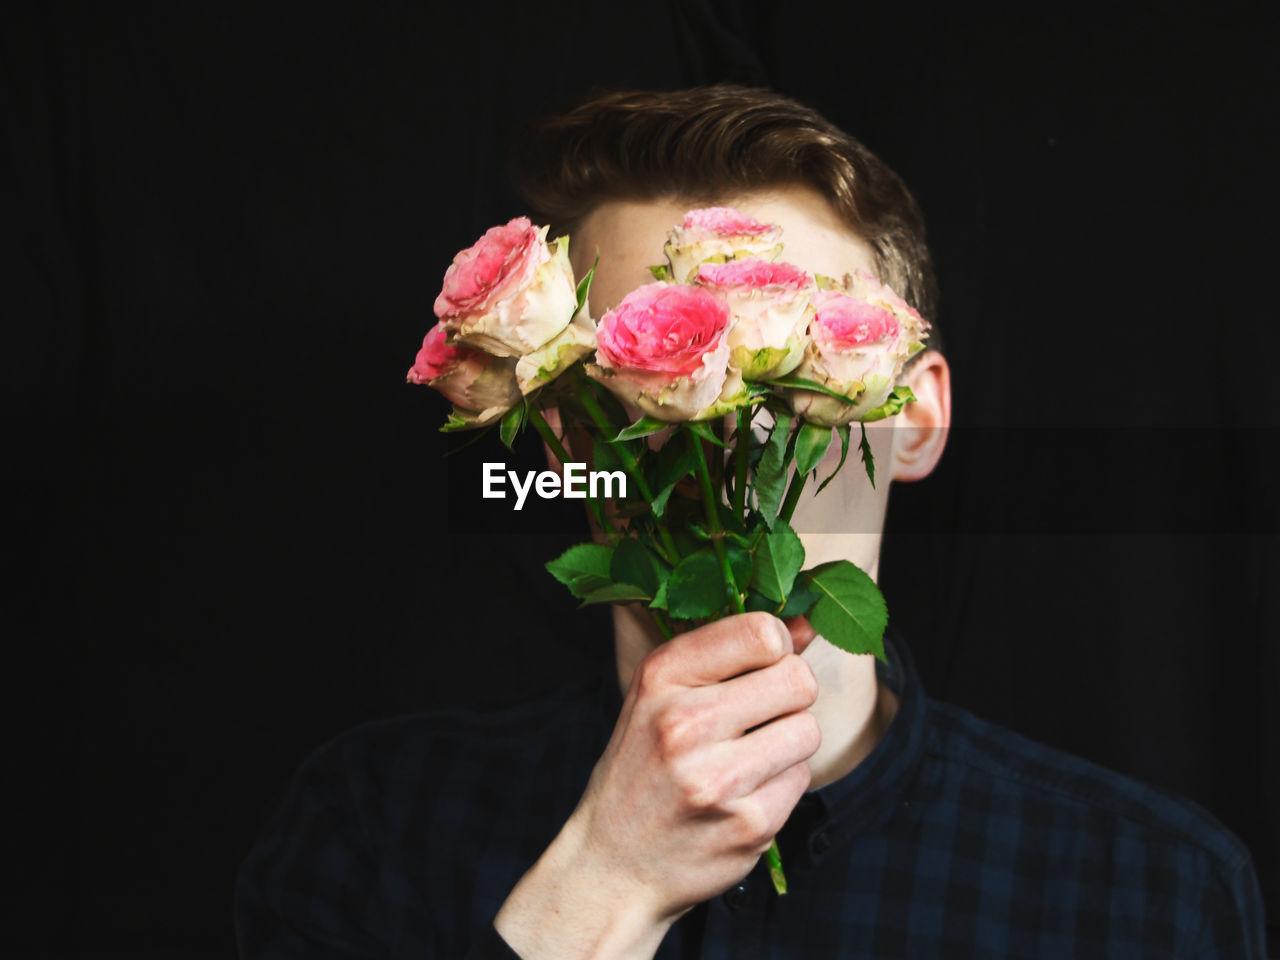 Man Holding Bouquet Against Black Background